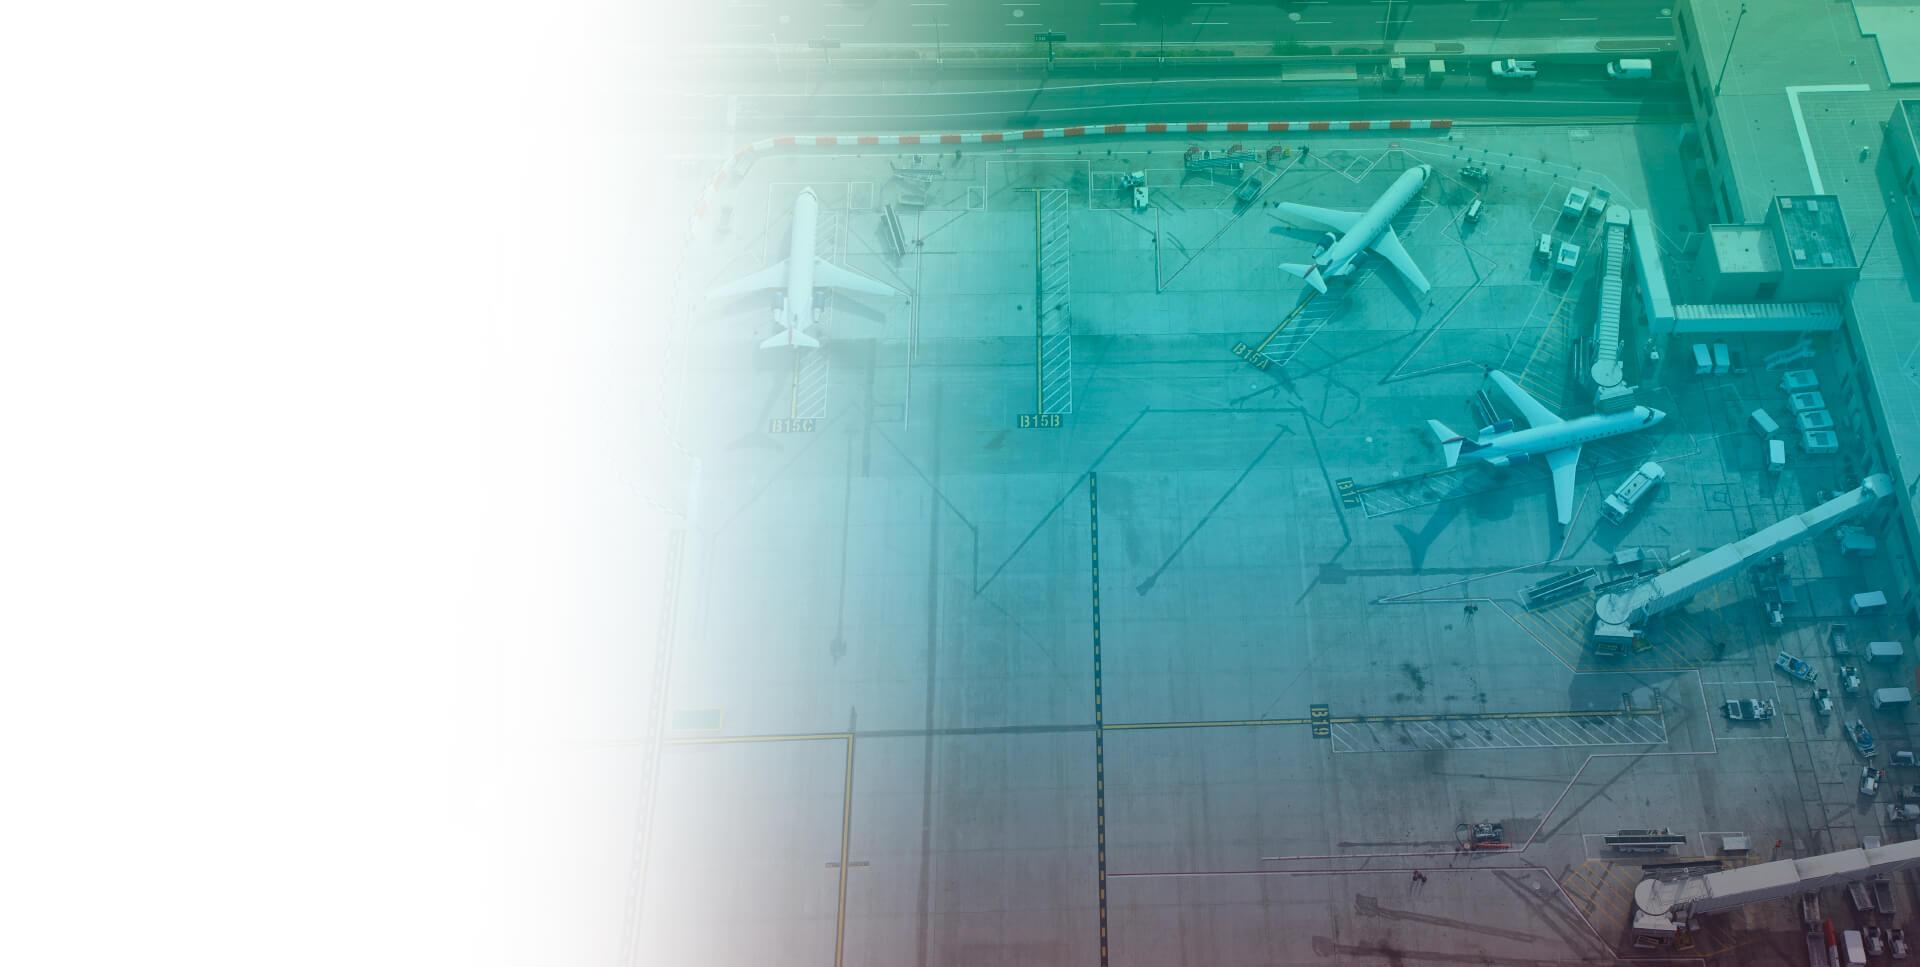 <span class='negritaslide'>Master in Sustainable<br />Air Transport Management<br />(MATSM).</span>